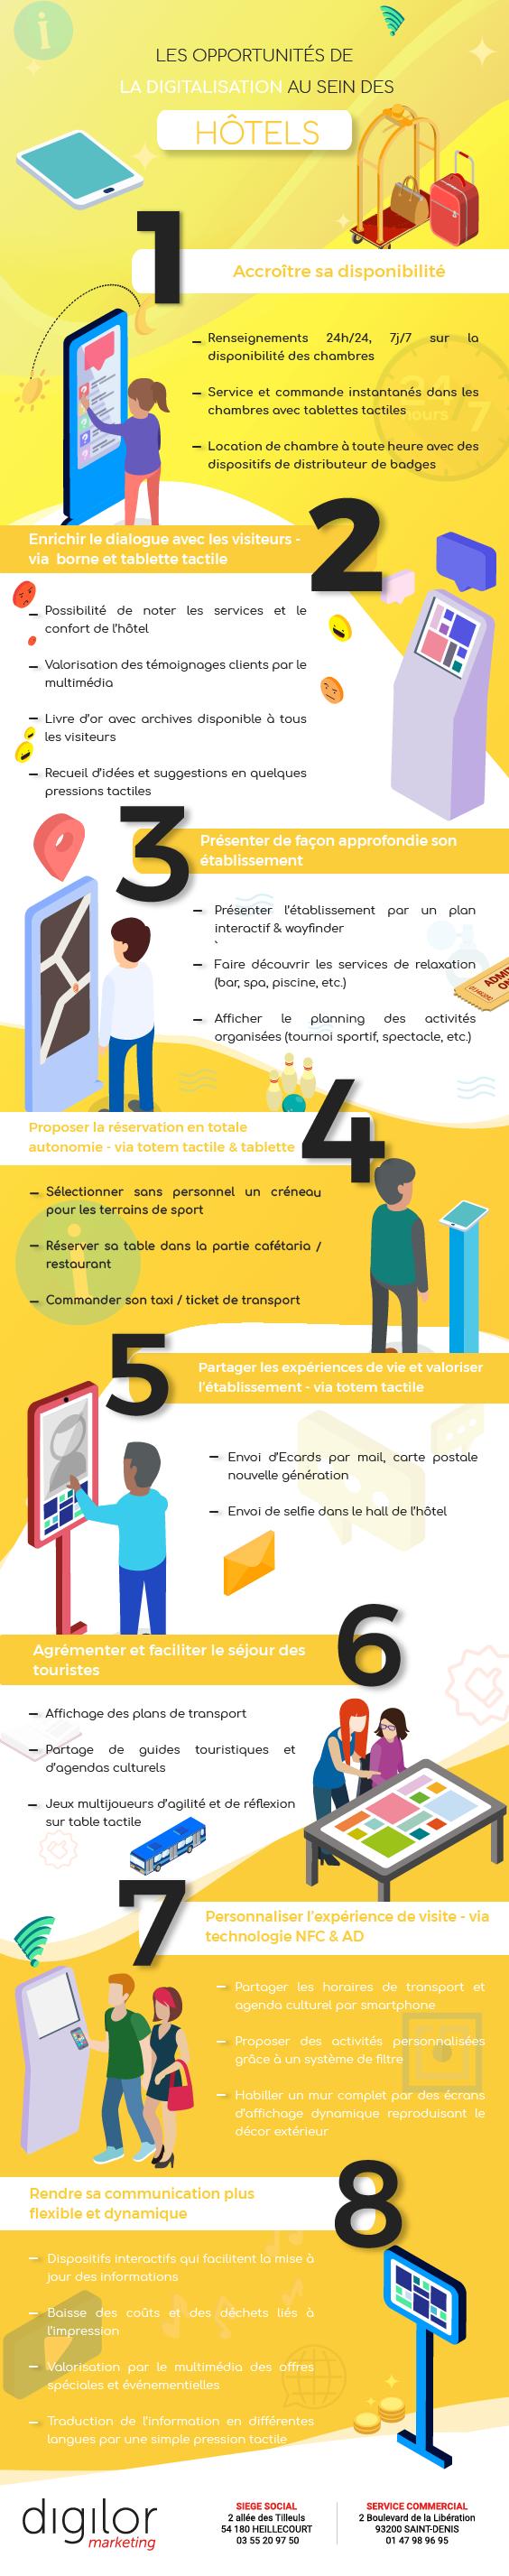 Infographie opportunités digitalisation hôtels